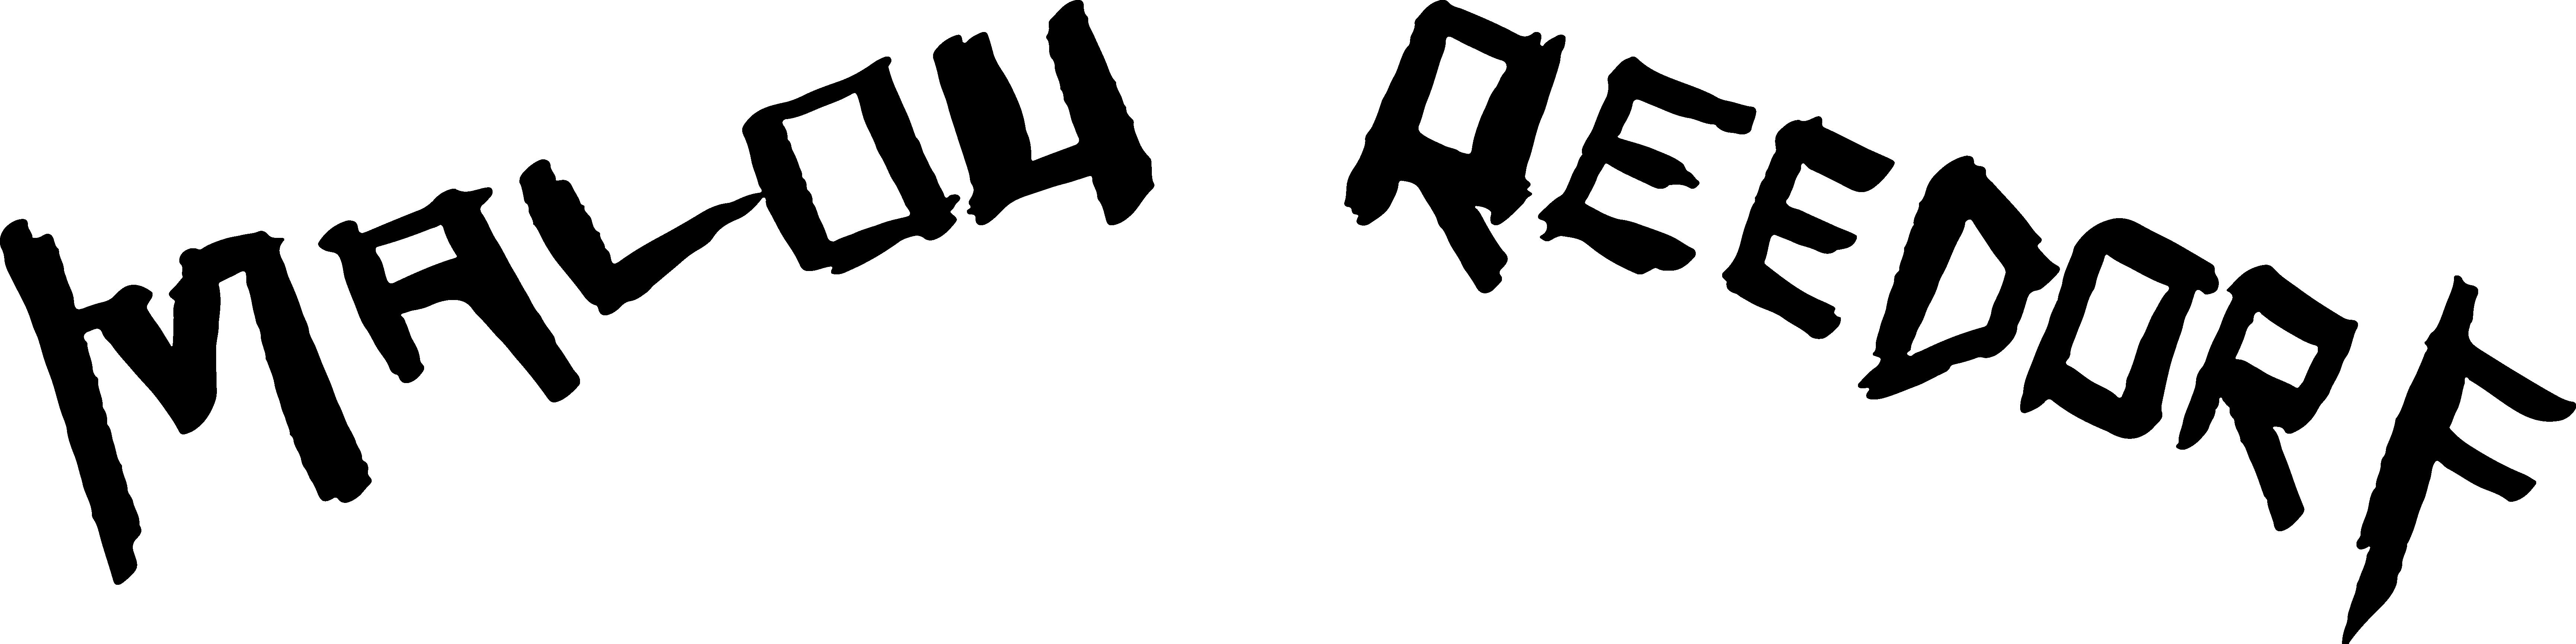 Malou Reedorf's Signature